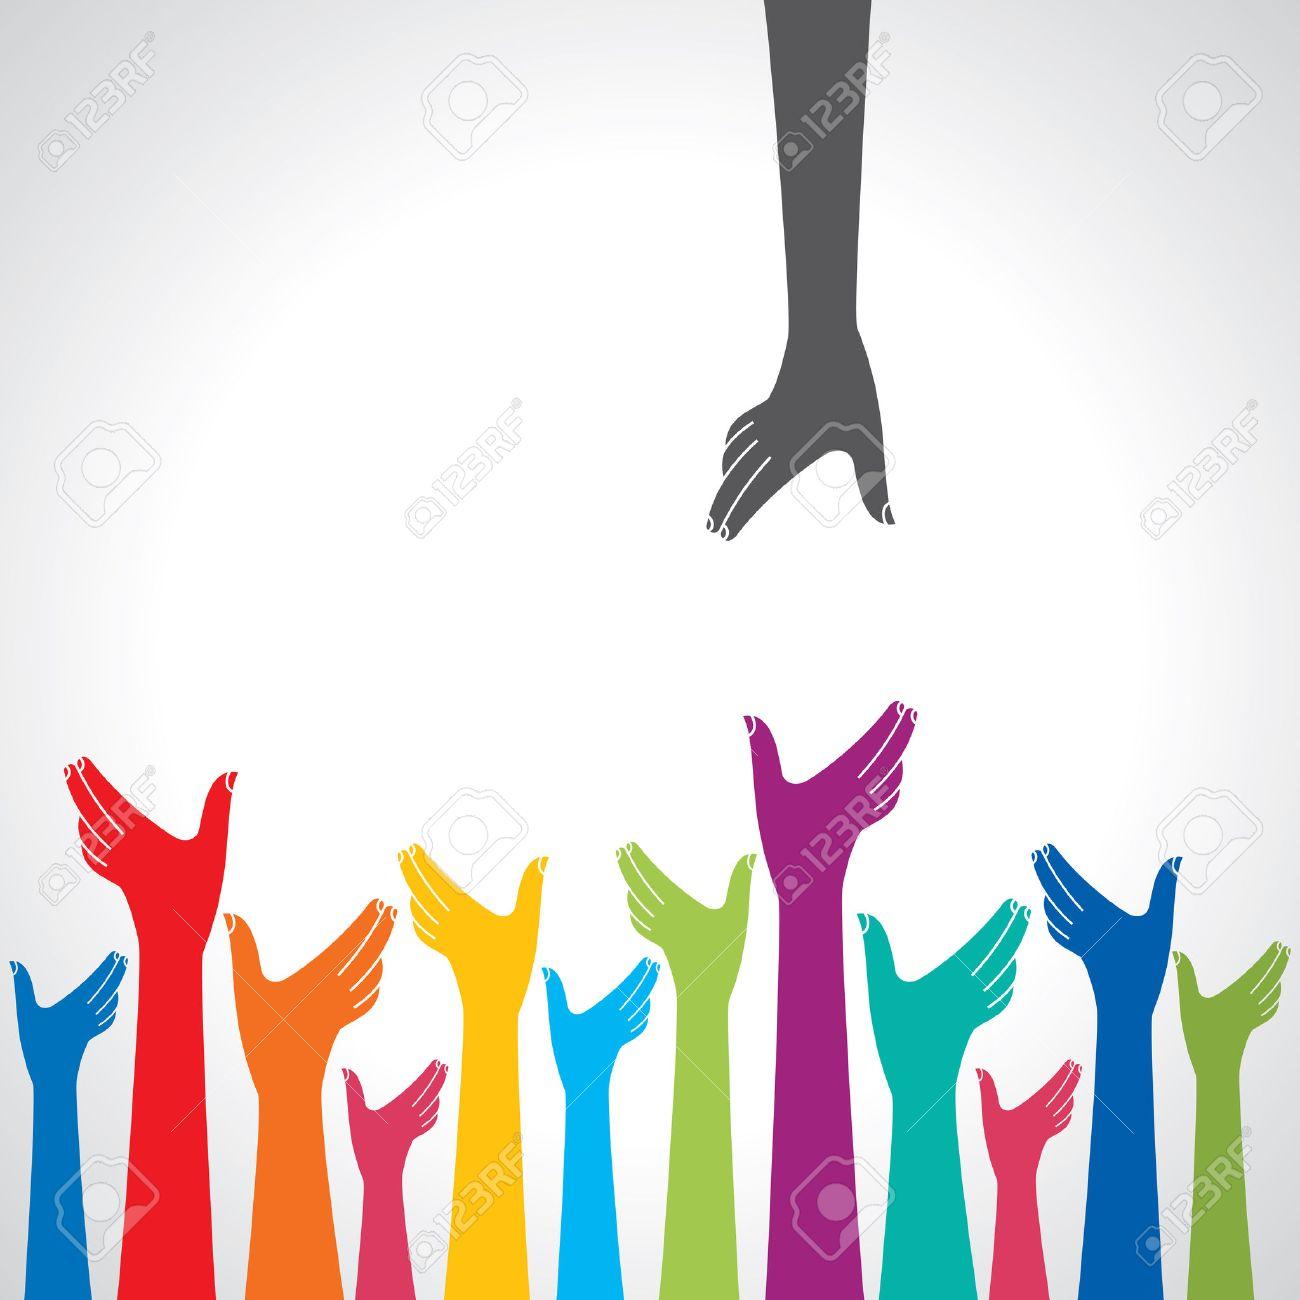 Team symbol. Multicolored hands Standard-Bild - 37109735